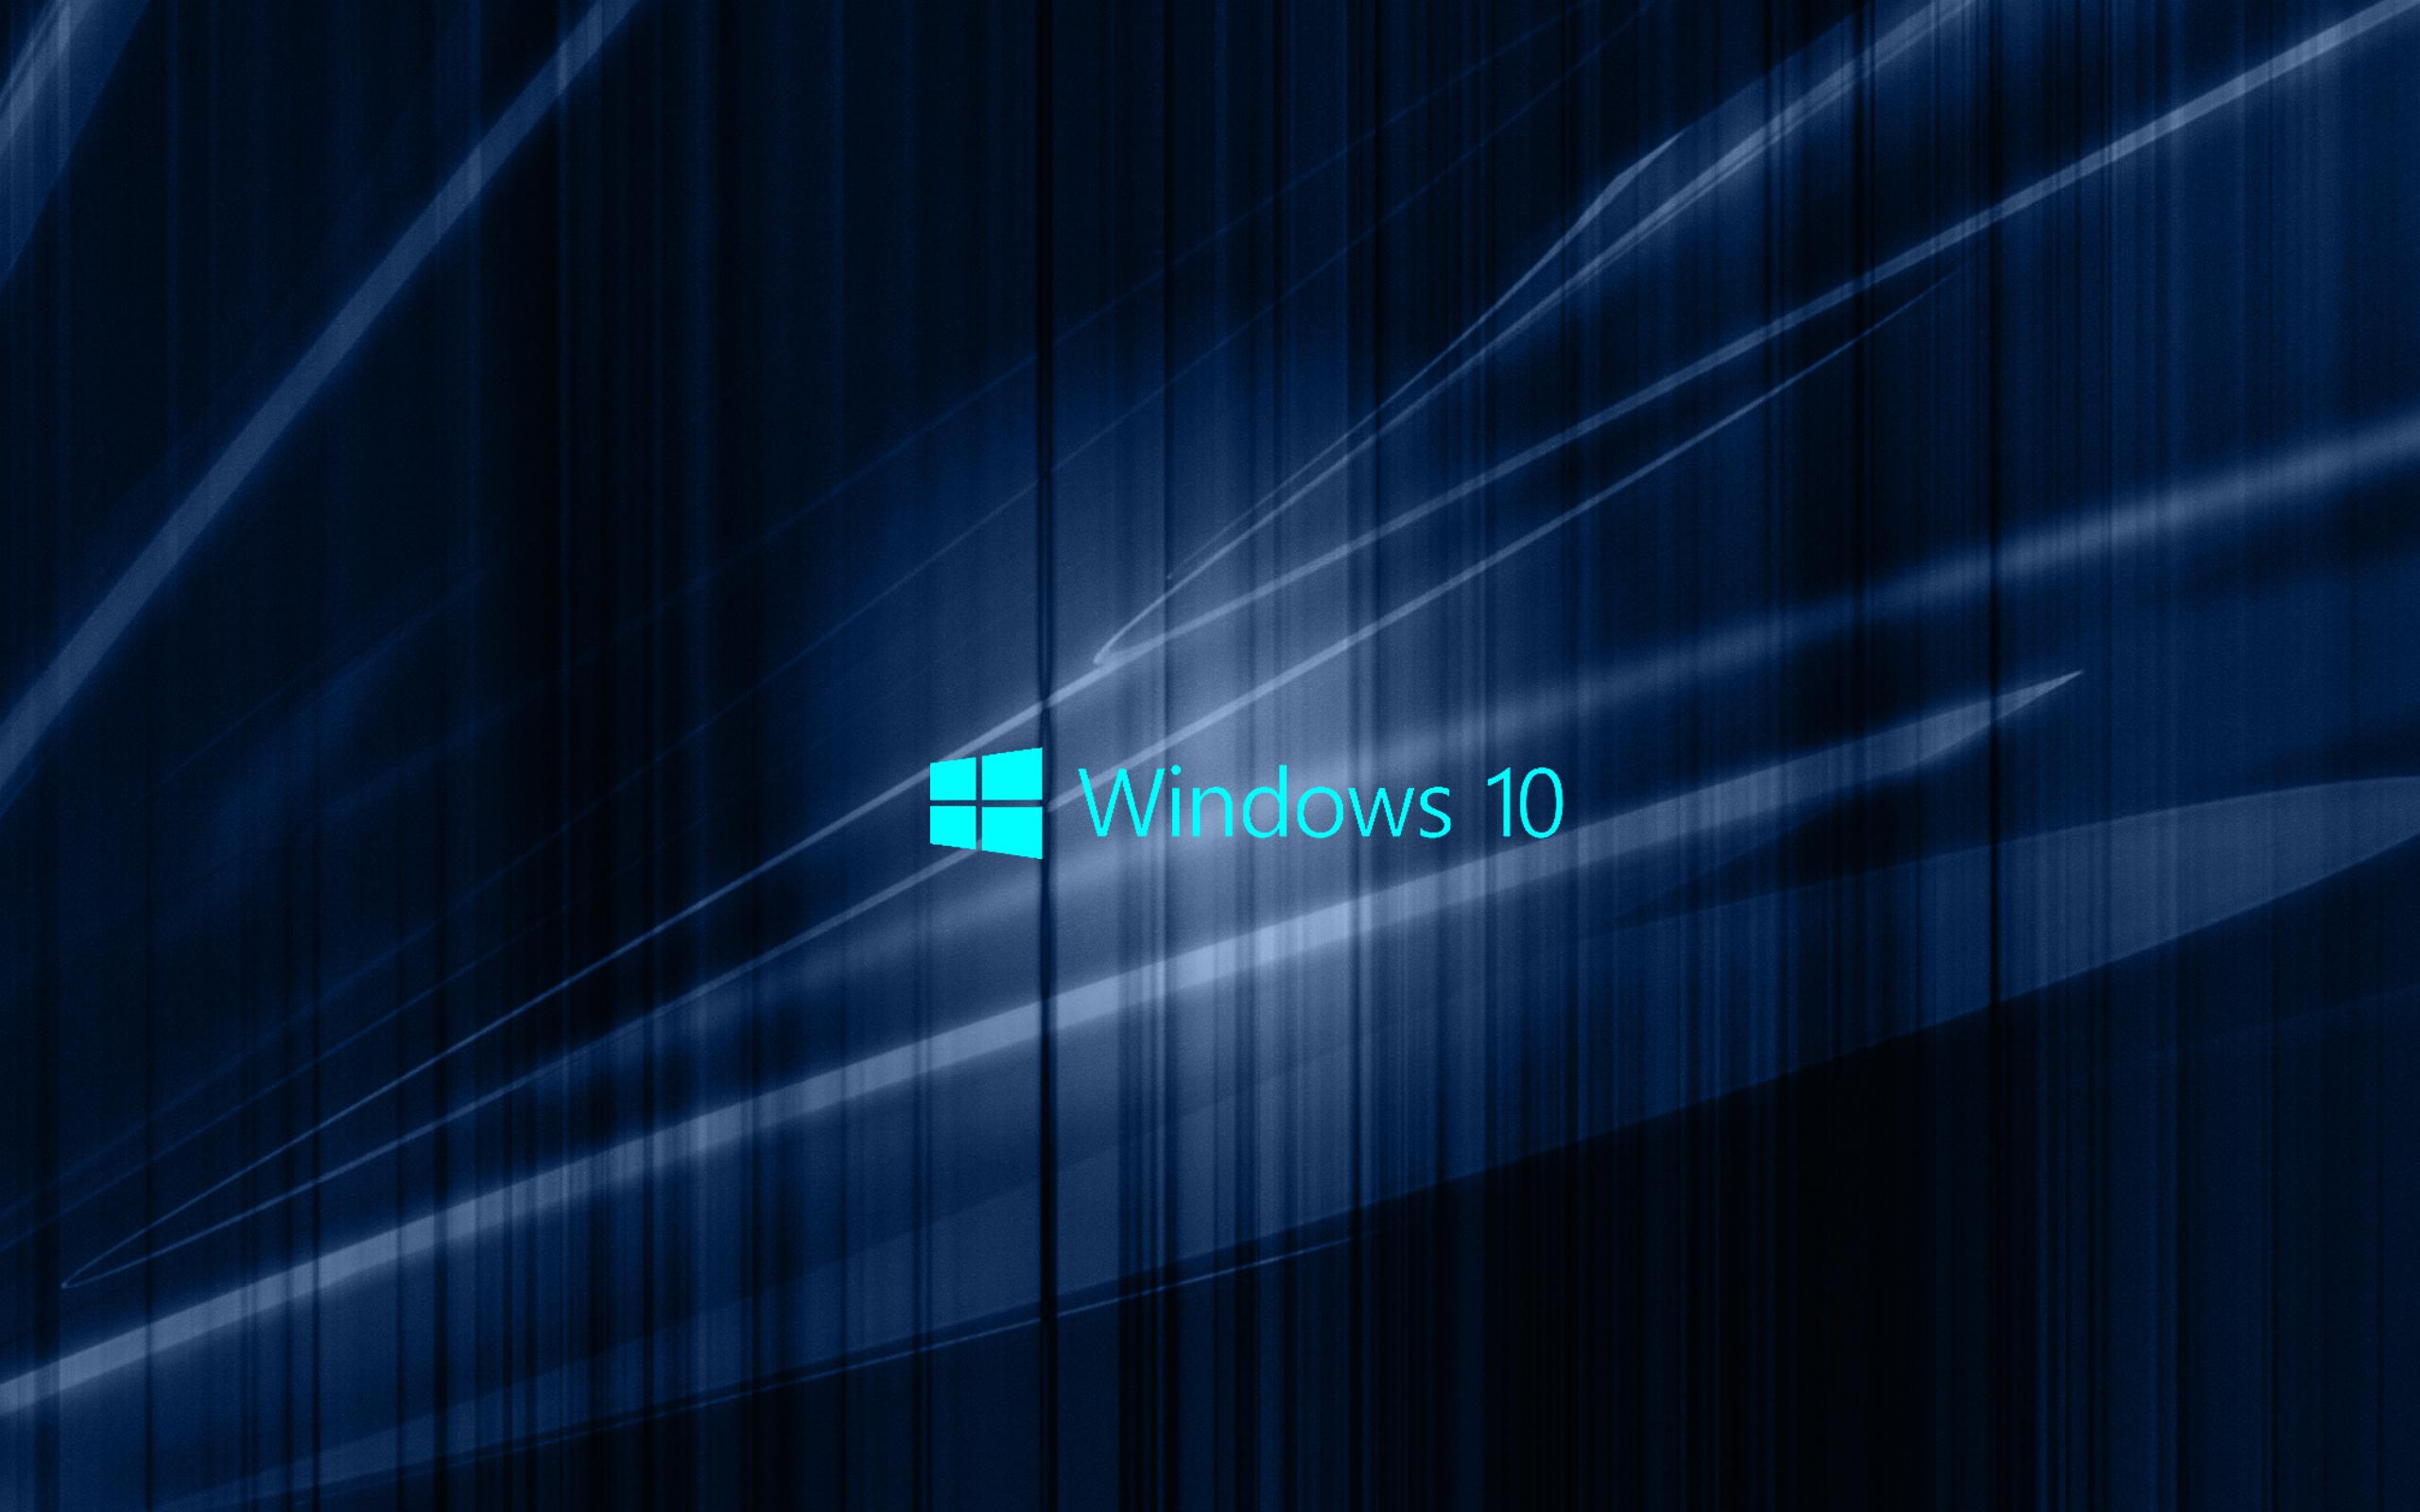 Windows-10-HD-Wallpaper-5